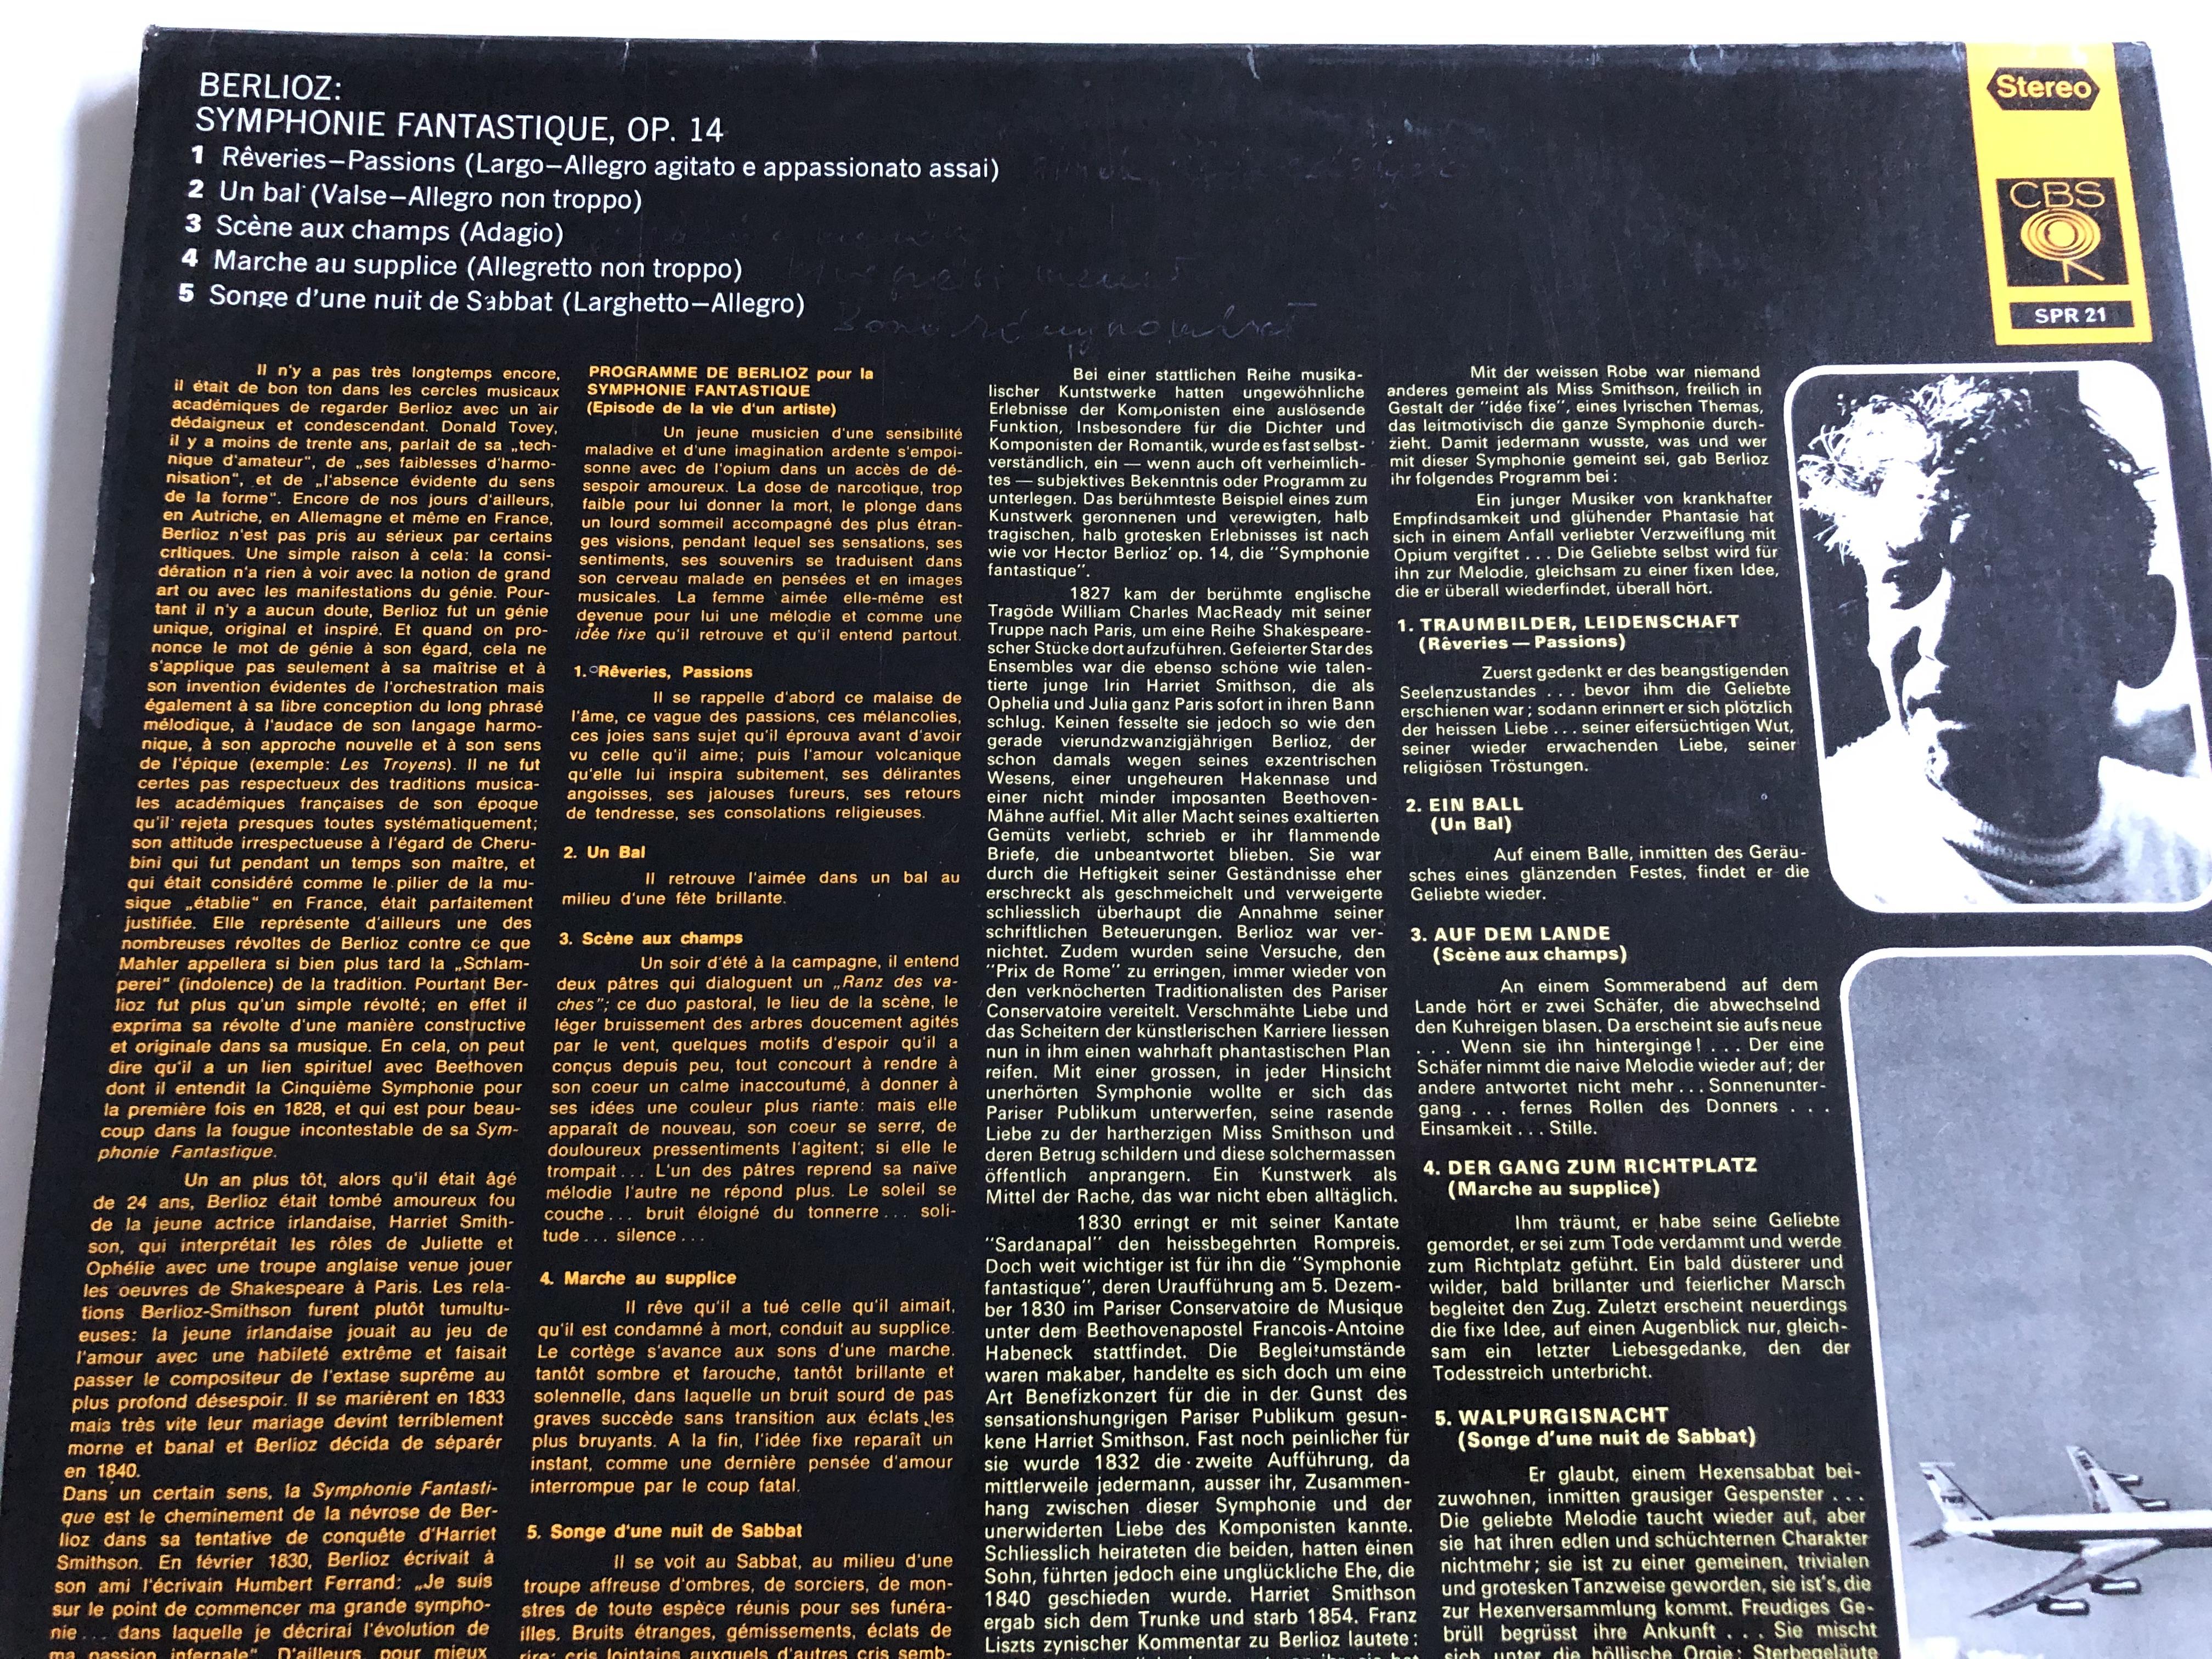 berlioz-symphonie-fantastique-leonard-bernstein-new-york-philharmonic-cbs-lp-stereo-spr-21-5-.jpg